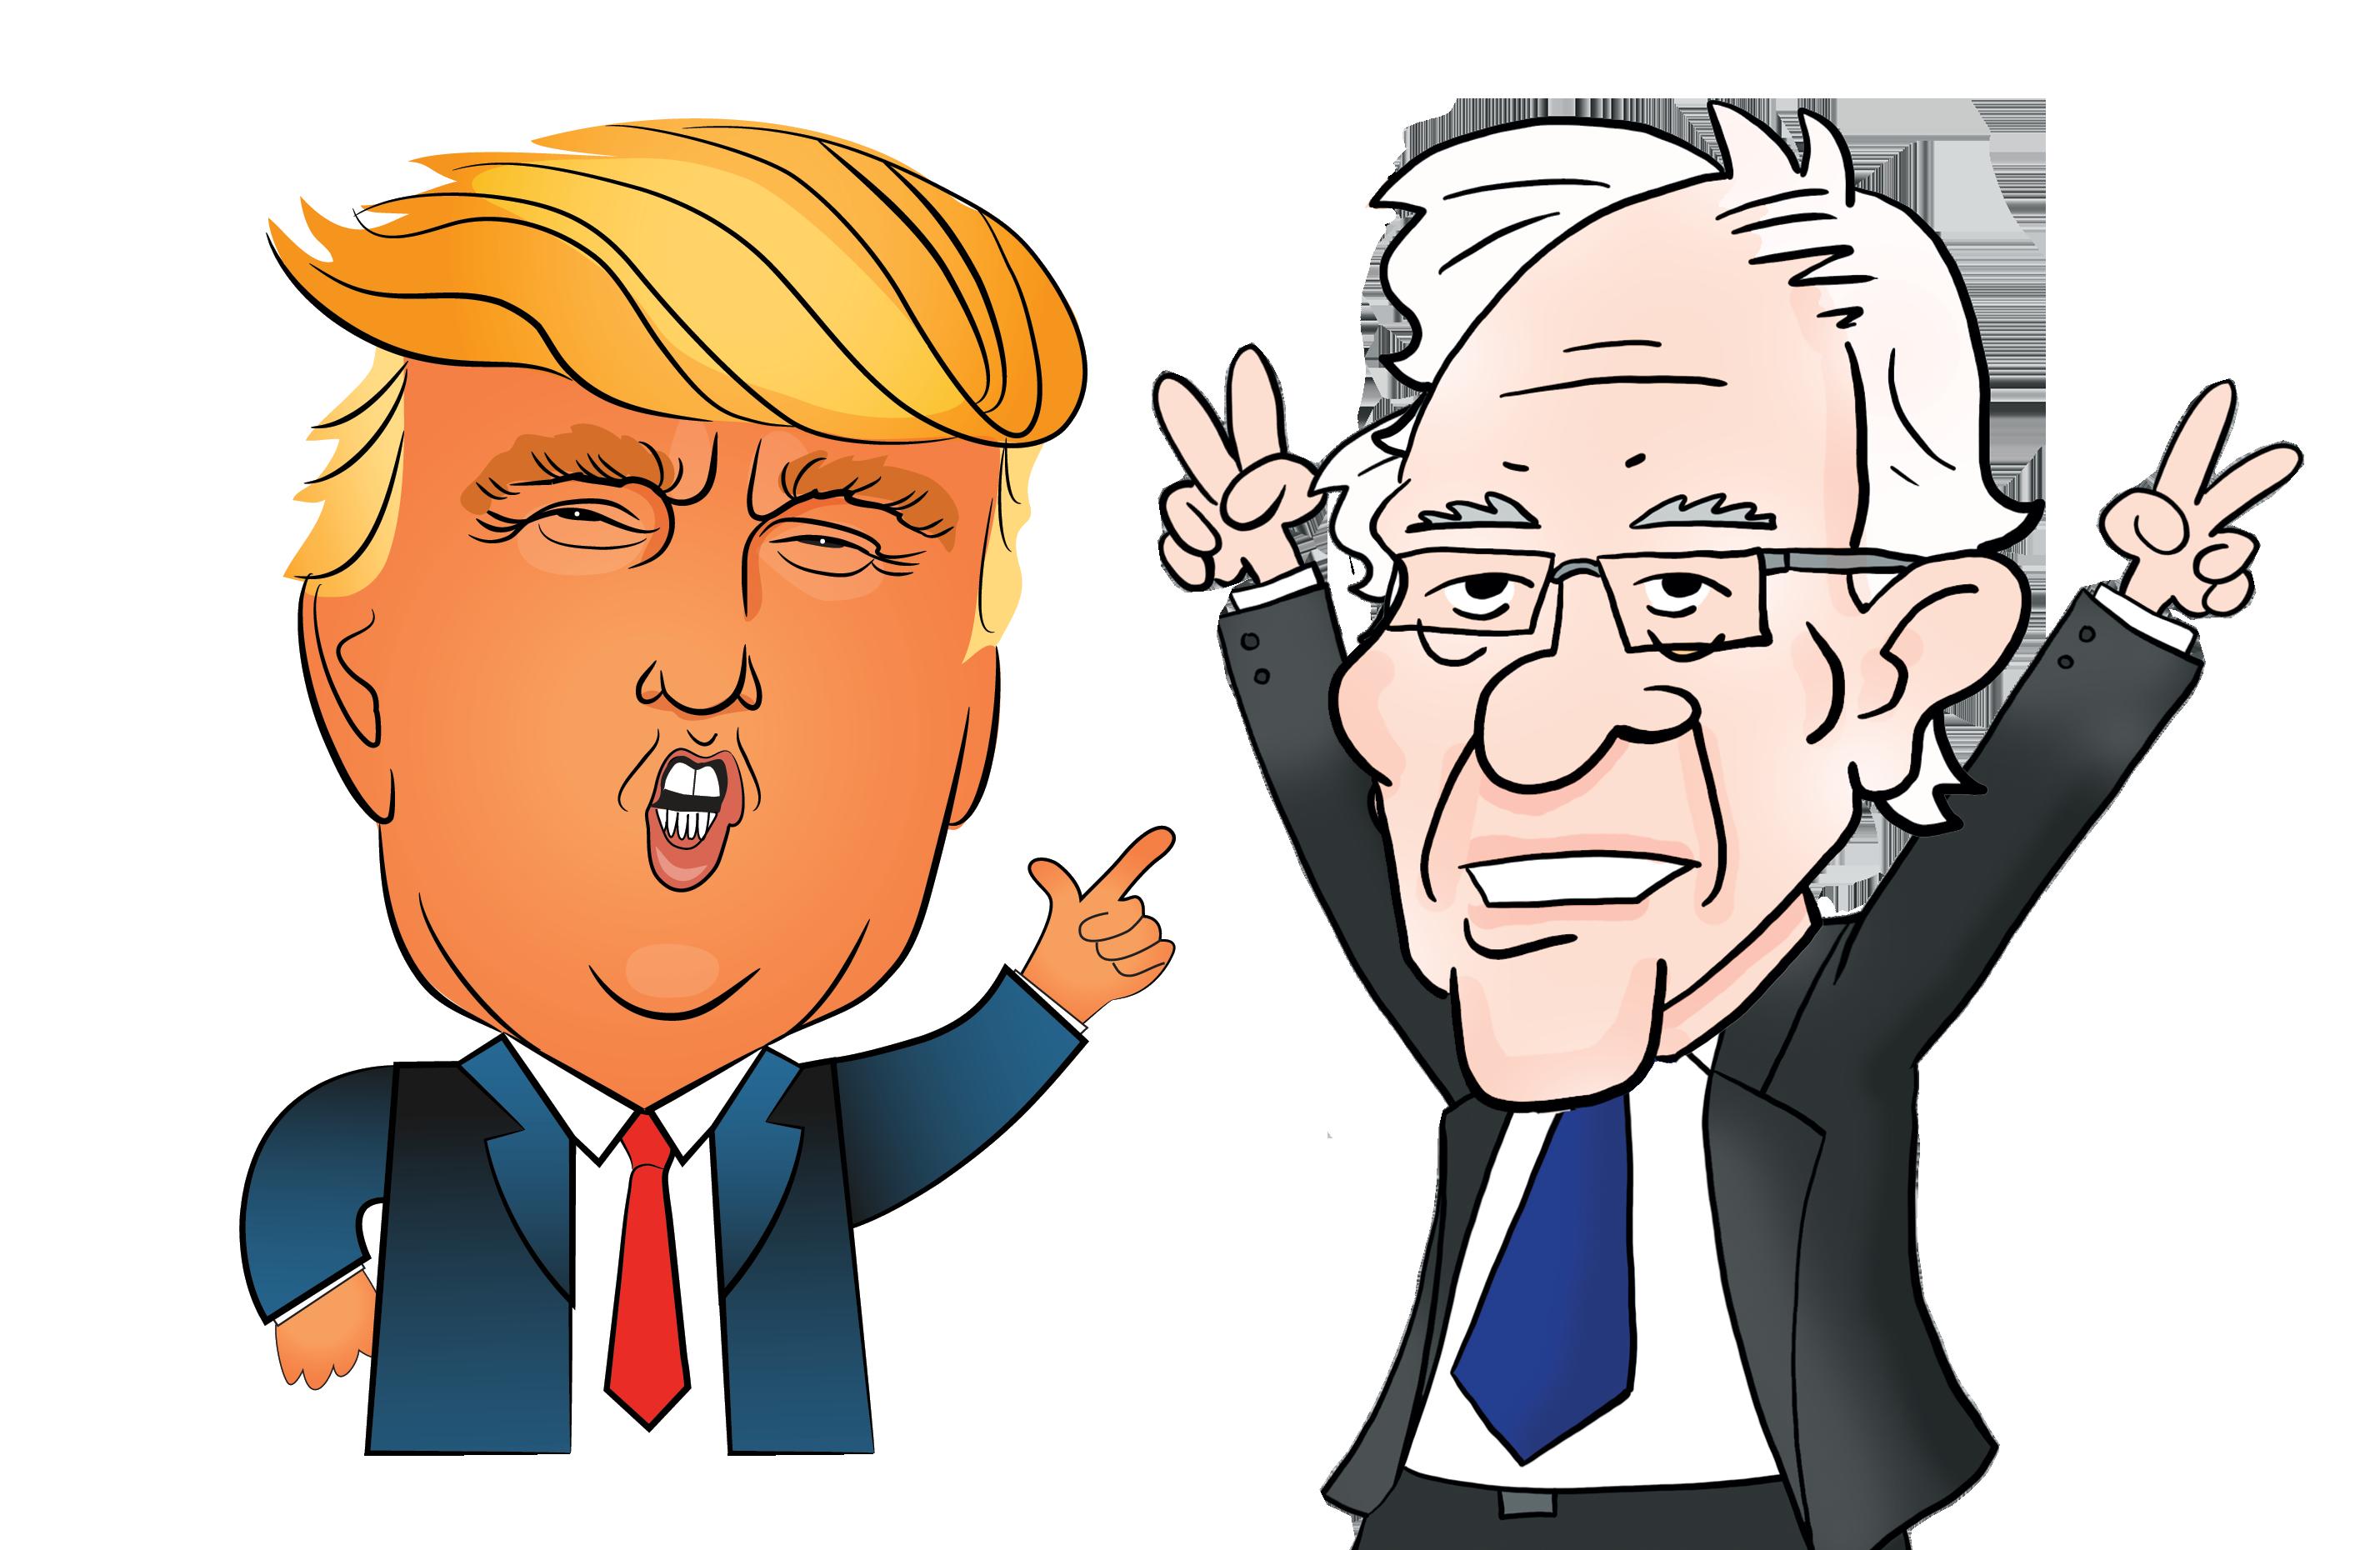 Human clipart creative. Trump sanders lessons on